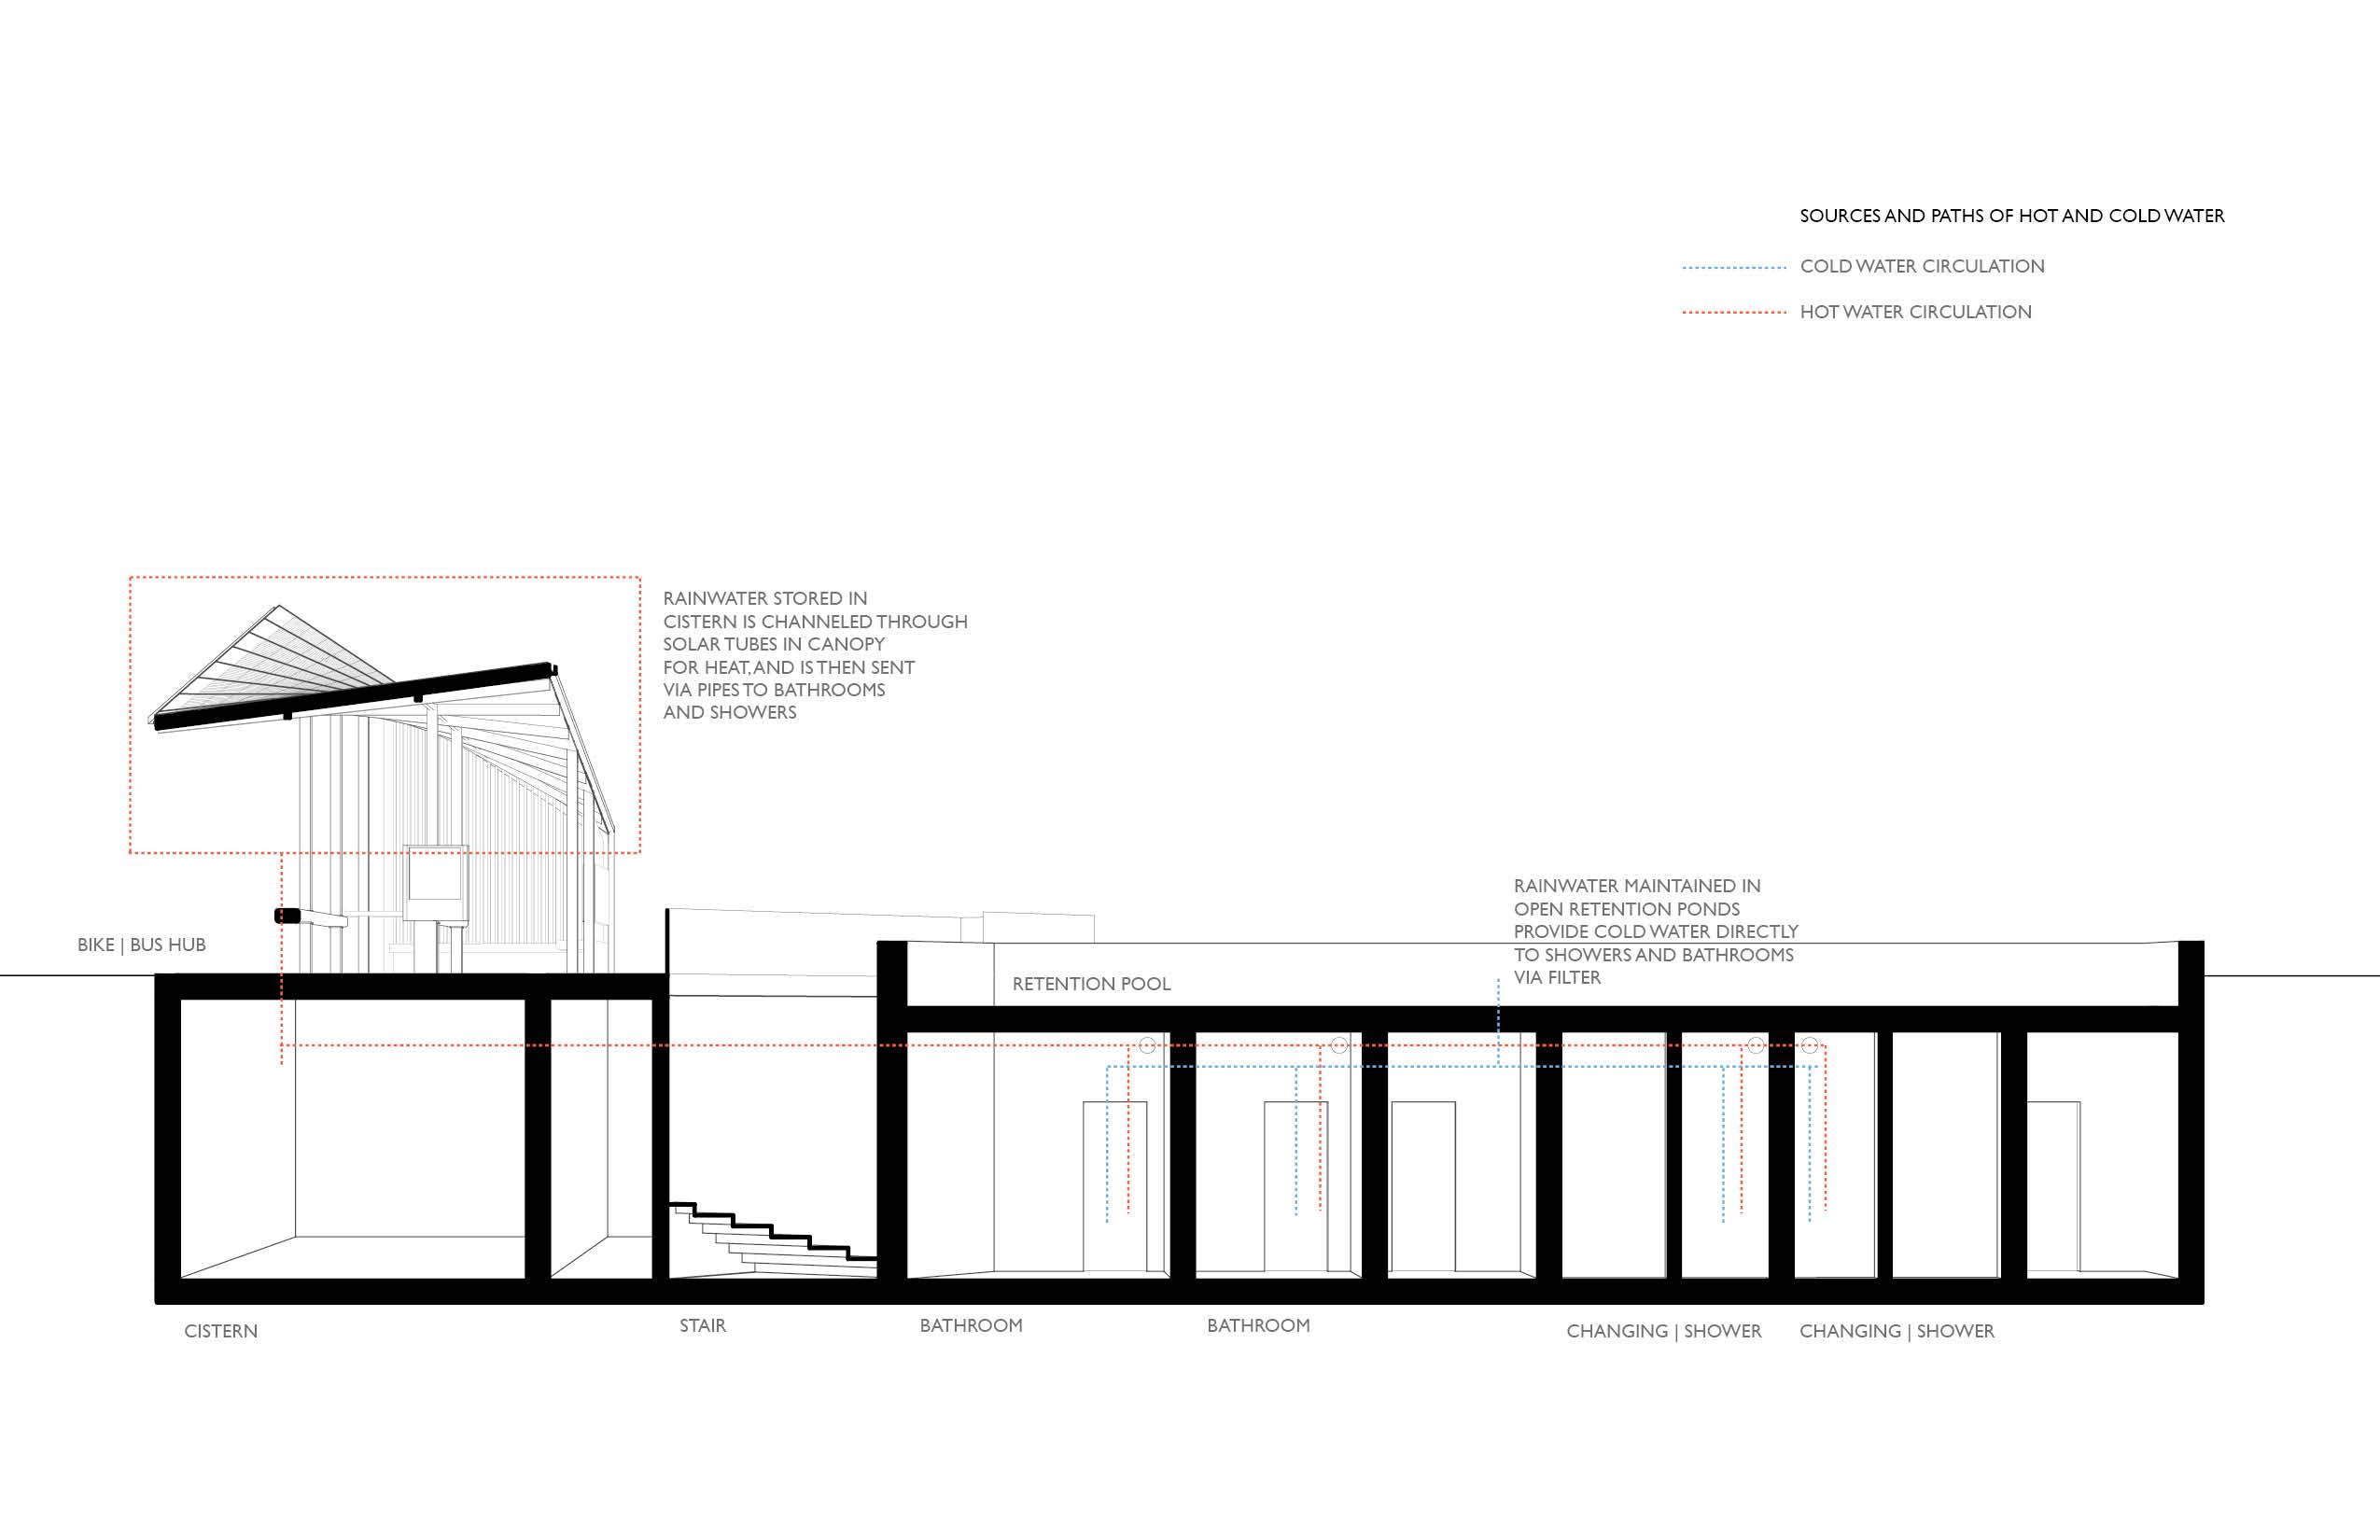 2550x1650 Development Of Bikeus Hub Jack Cochran Writing And Research